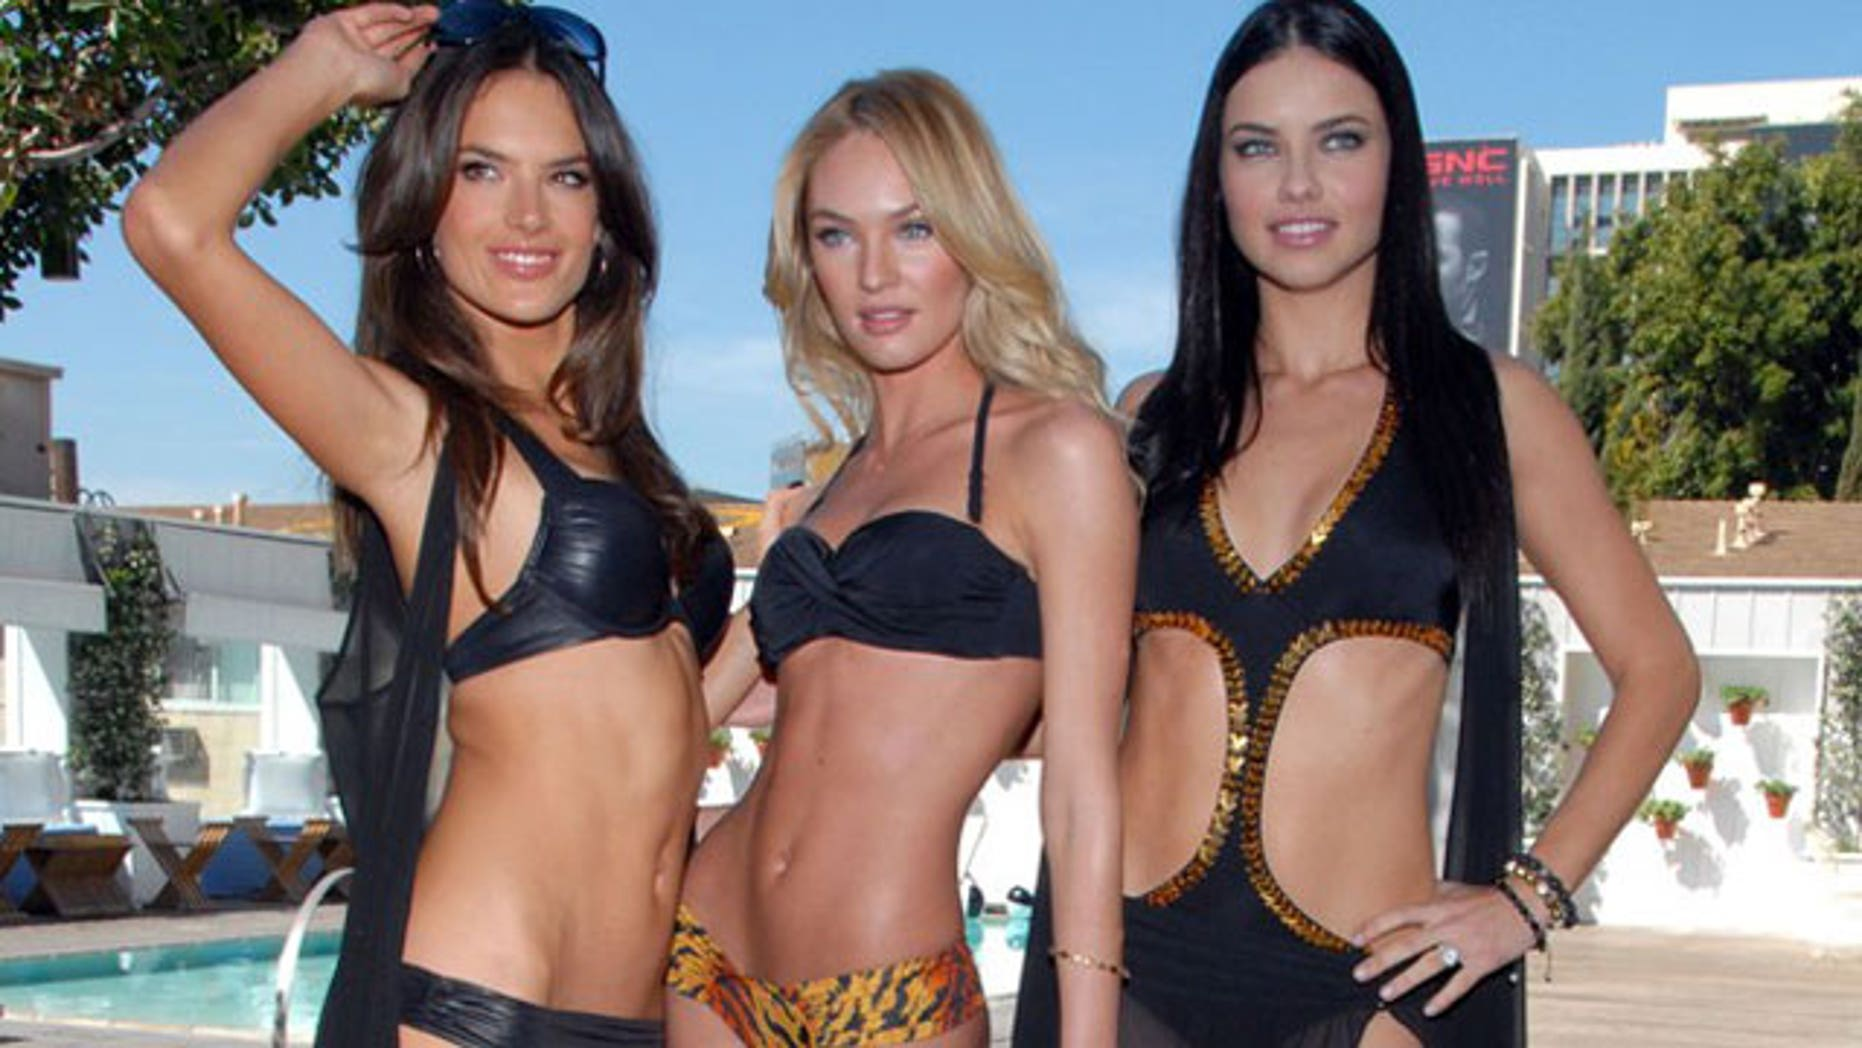 Victoria's Secret Models Alessandra Ambrosio, Candice Swanepoel and Adriana Lima.